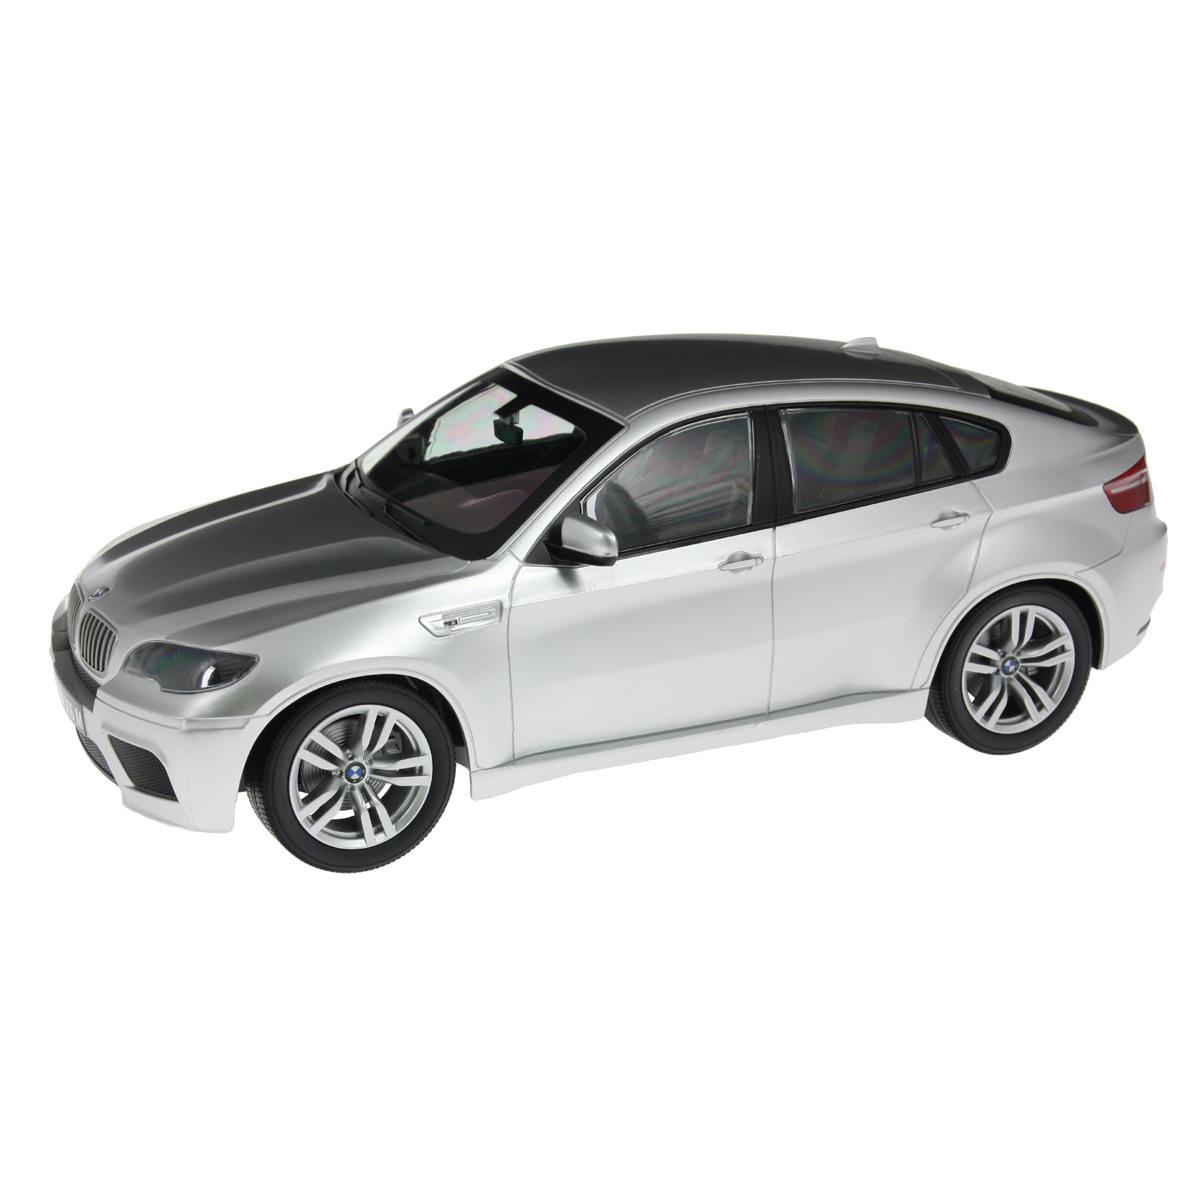 Bmw X6 M: MJX 8541B Silver BMW X6 M-Edition RC Car At Hobby Warehouse